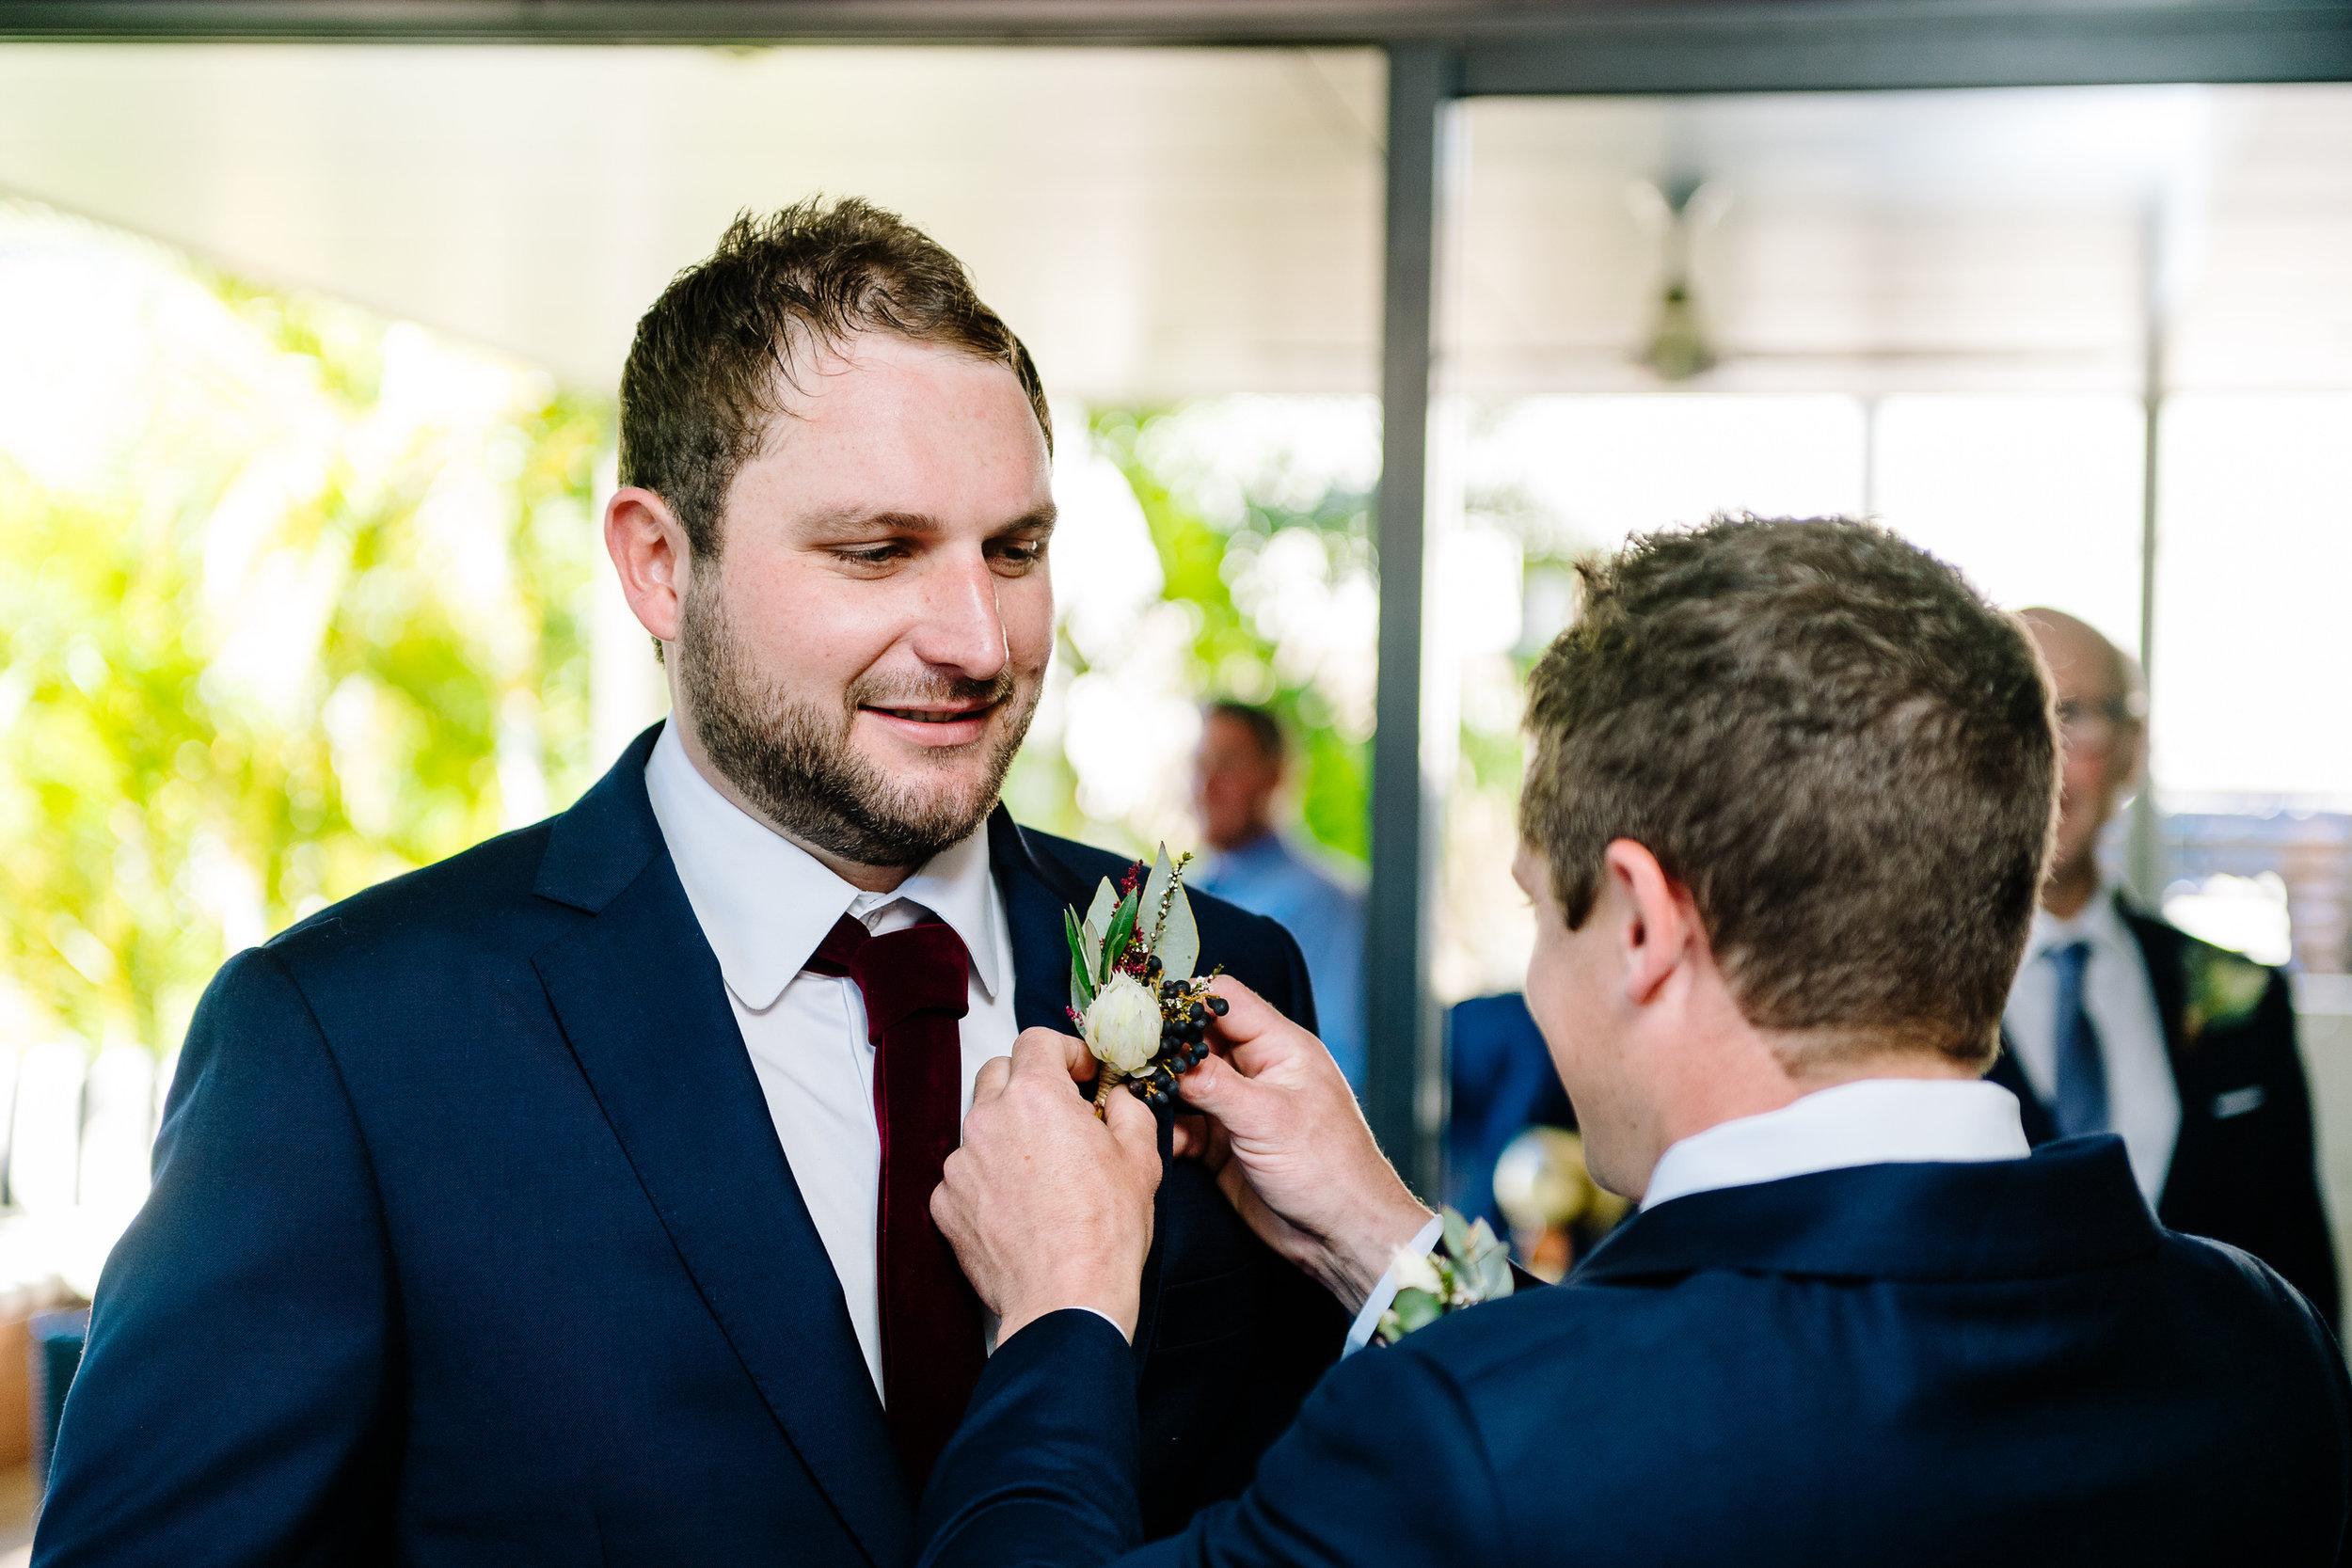 Justin_And_Jim_Photography_Byron_Bay_Wedding017.JPG